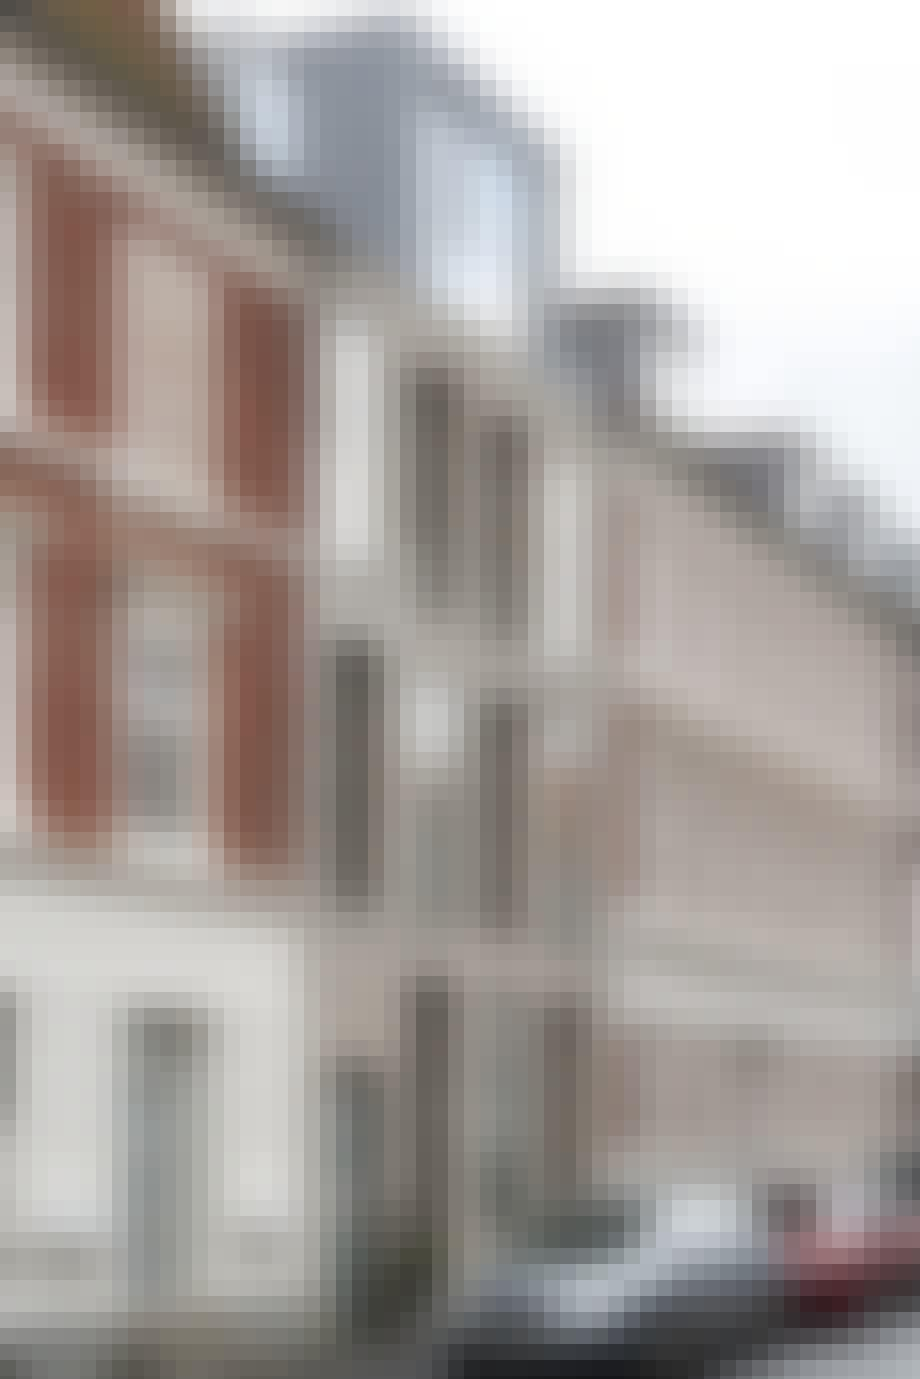 byhus århus moderne renovering facade